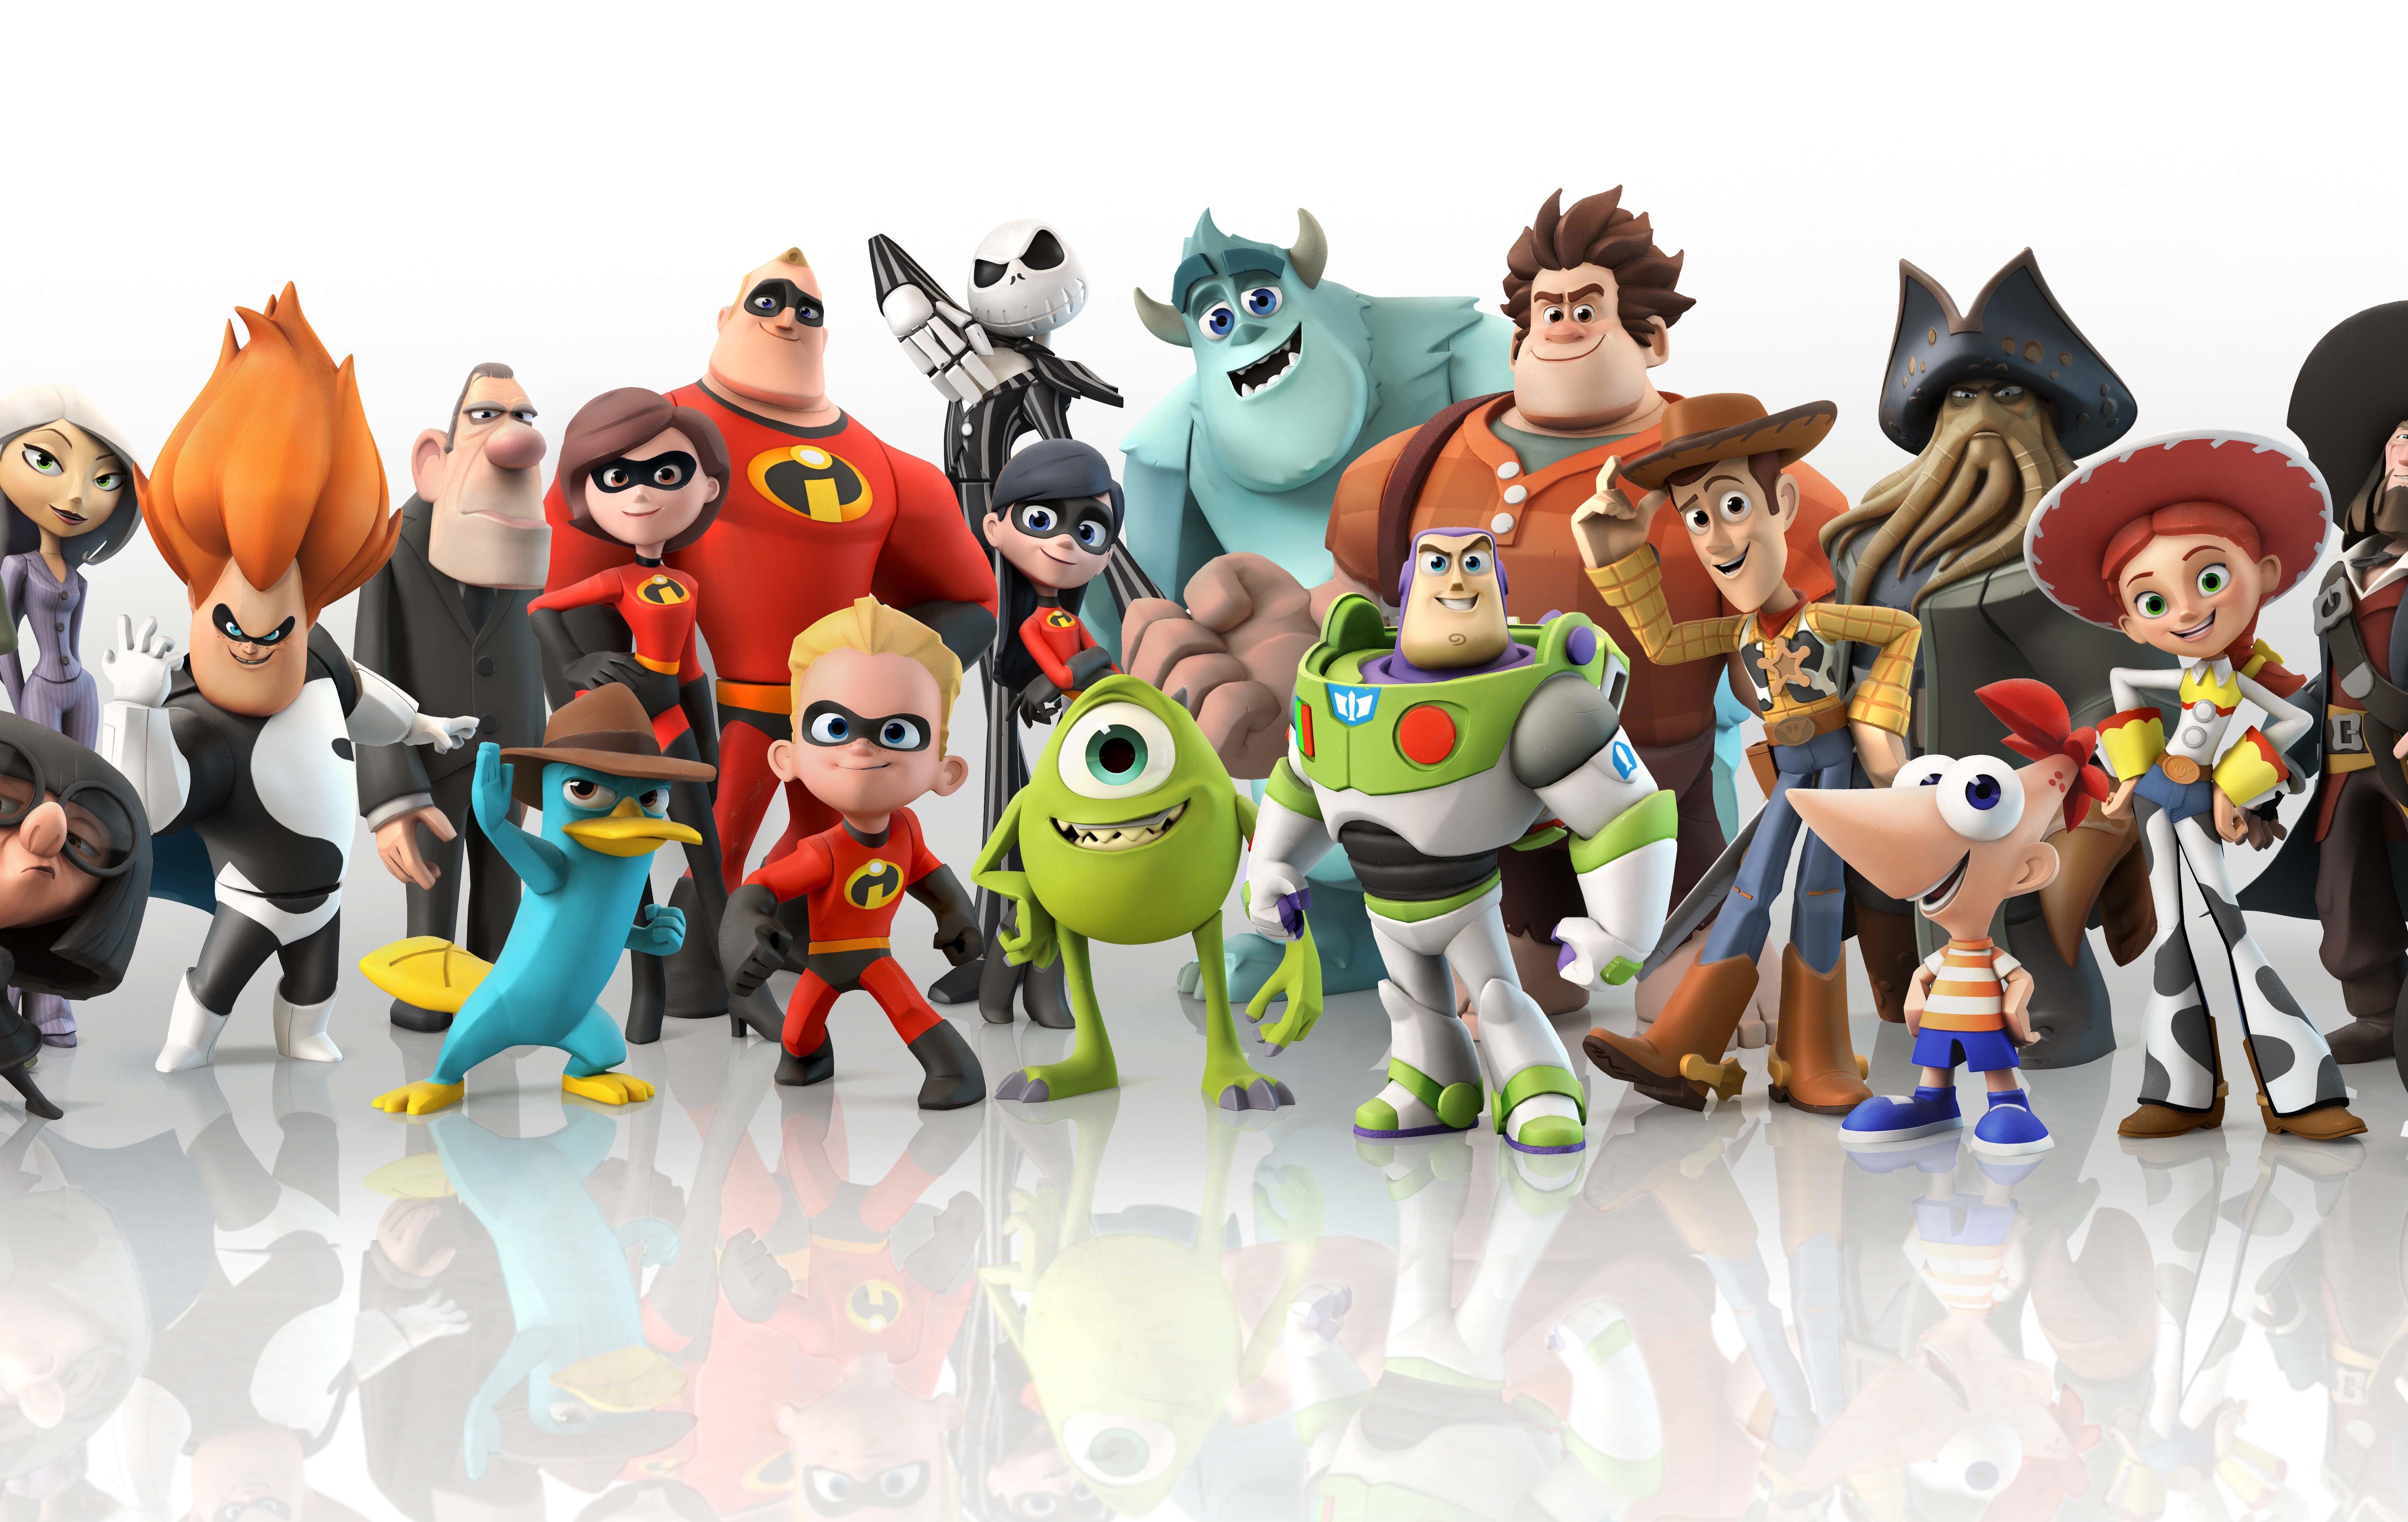 Disney Pixar Monsters University 3 Piece Room In A Box: Disney Rips Off Skylanders, Activision Responds